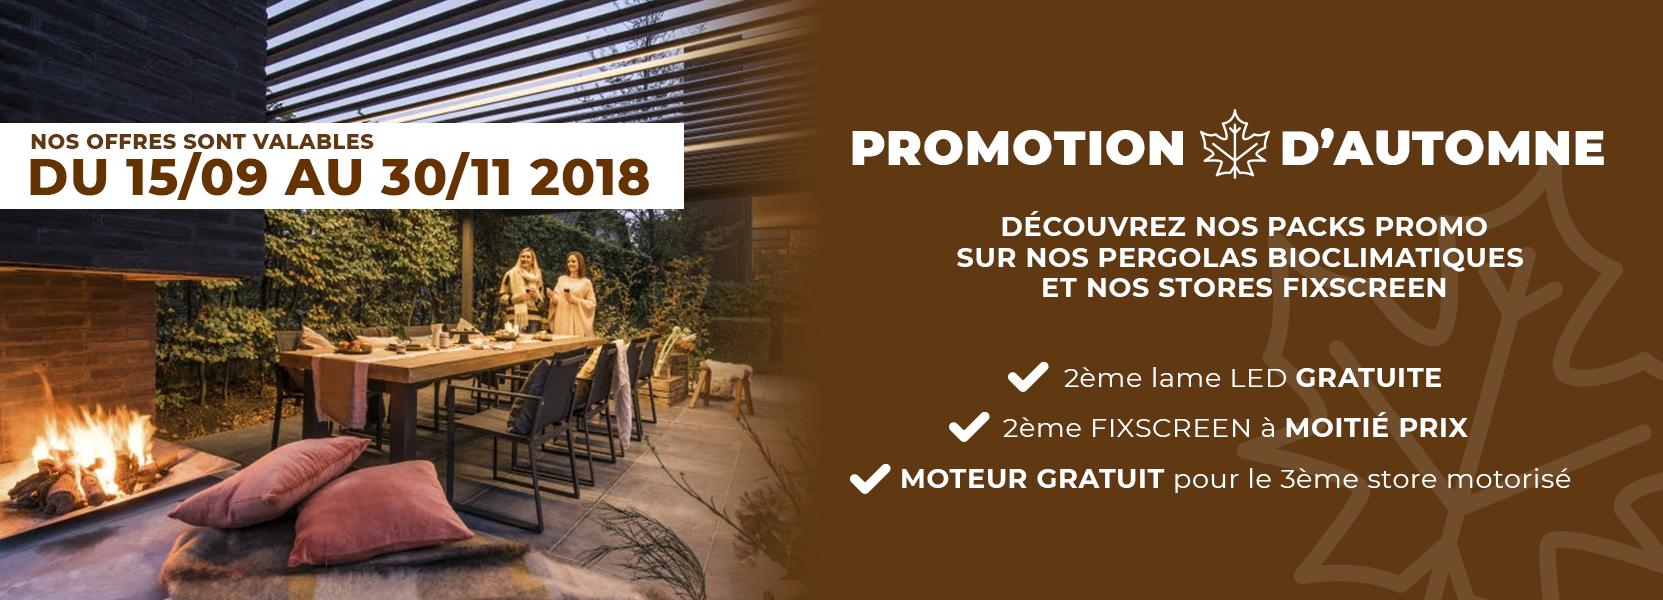 Promotion d'automne Novirtua